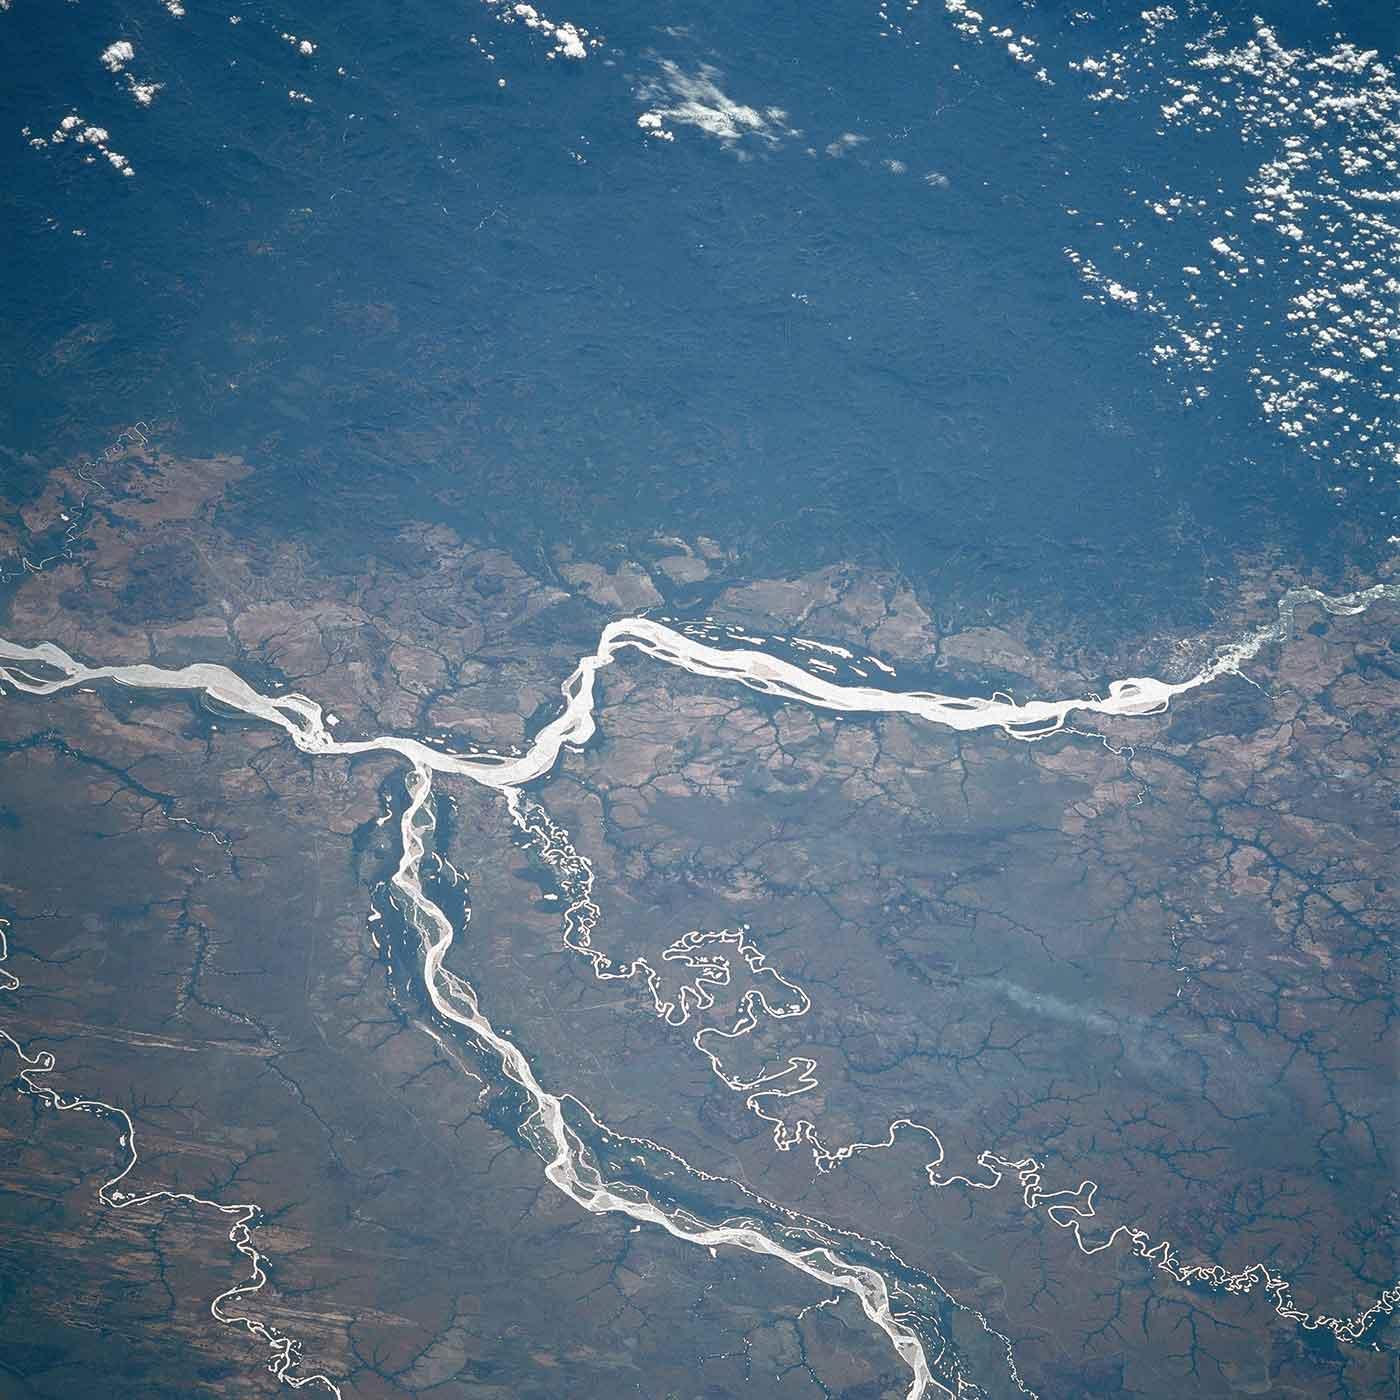 Orinoco, Meta Rivers, Colombia and Venezuela January 1986, by NASA